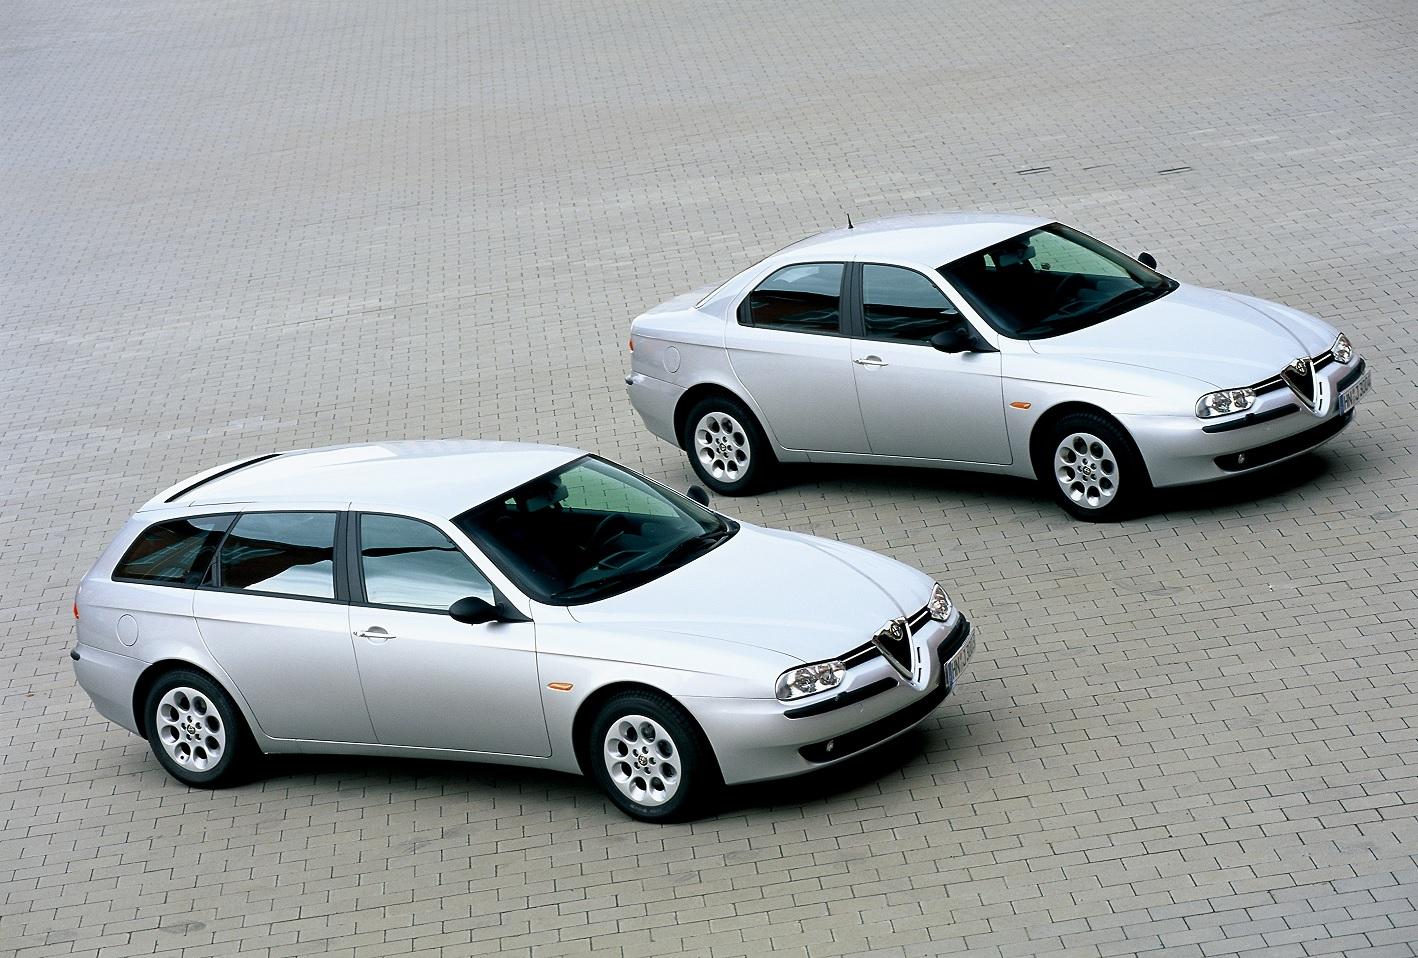 alfa romeo 156 sedan e sportwagn prata frente